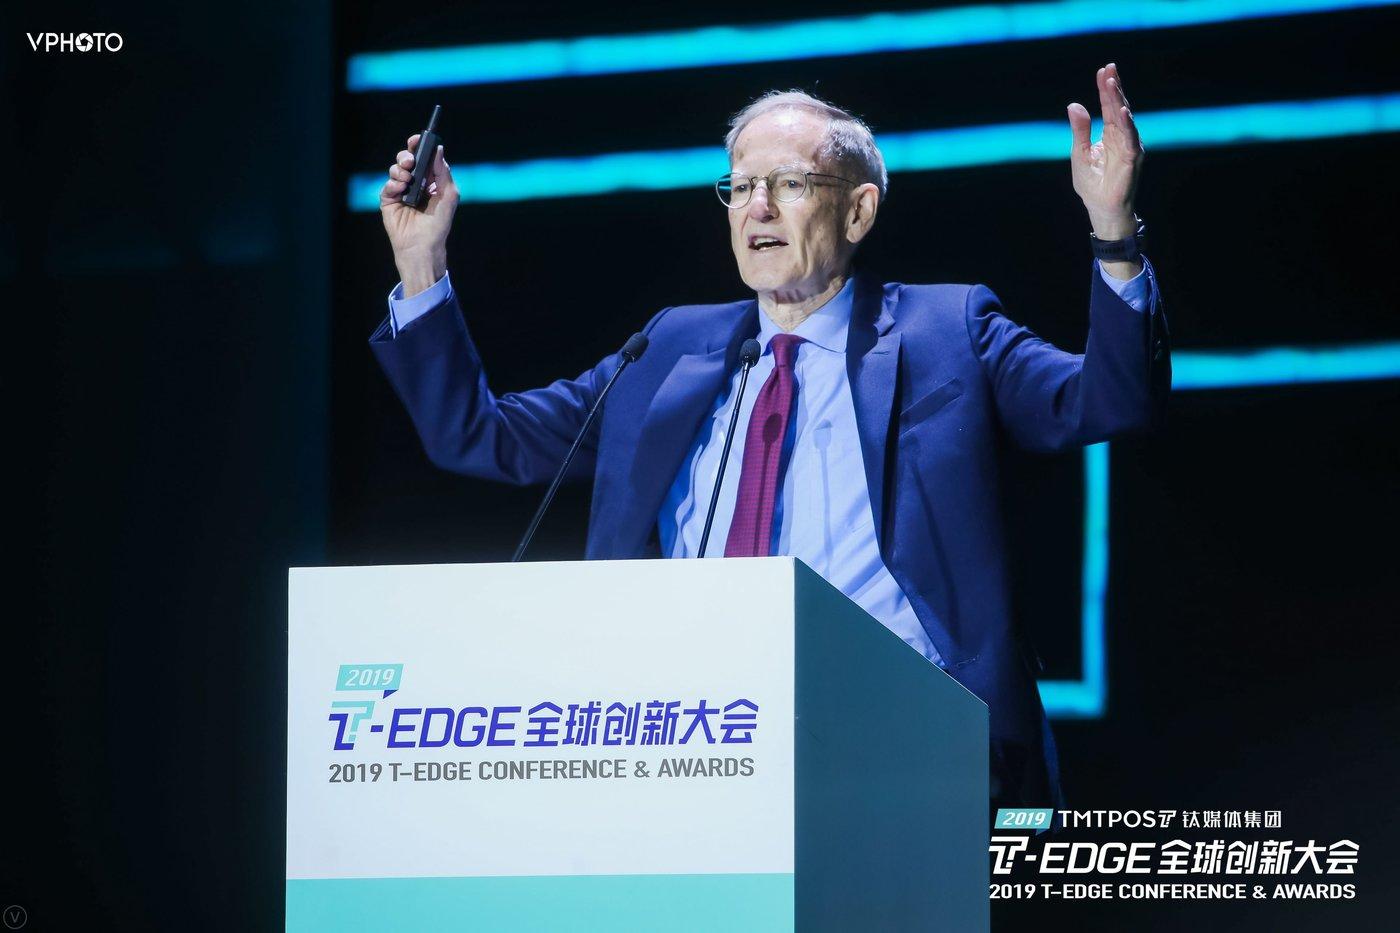 George Gilder, renowned U.S. economist and futurist, speaking at T-EDGE 2019